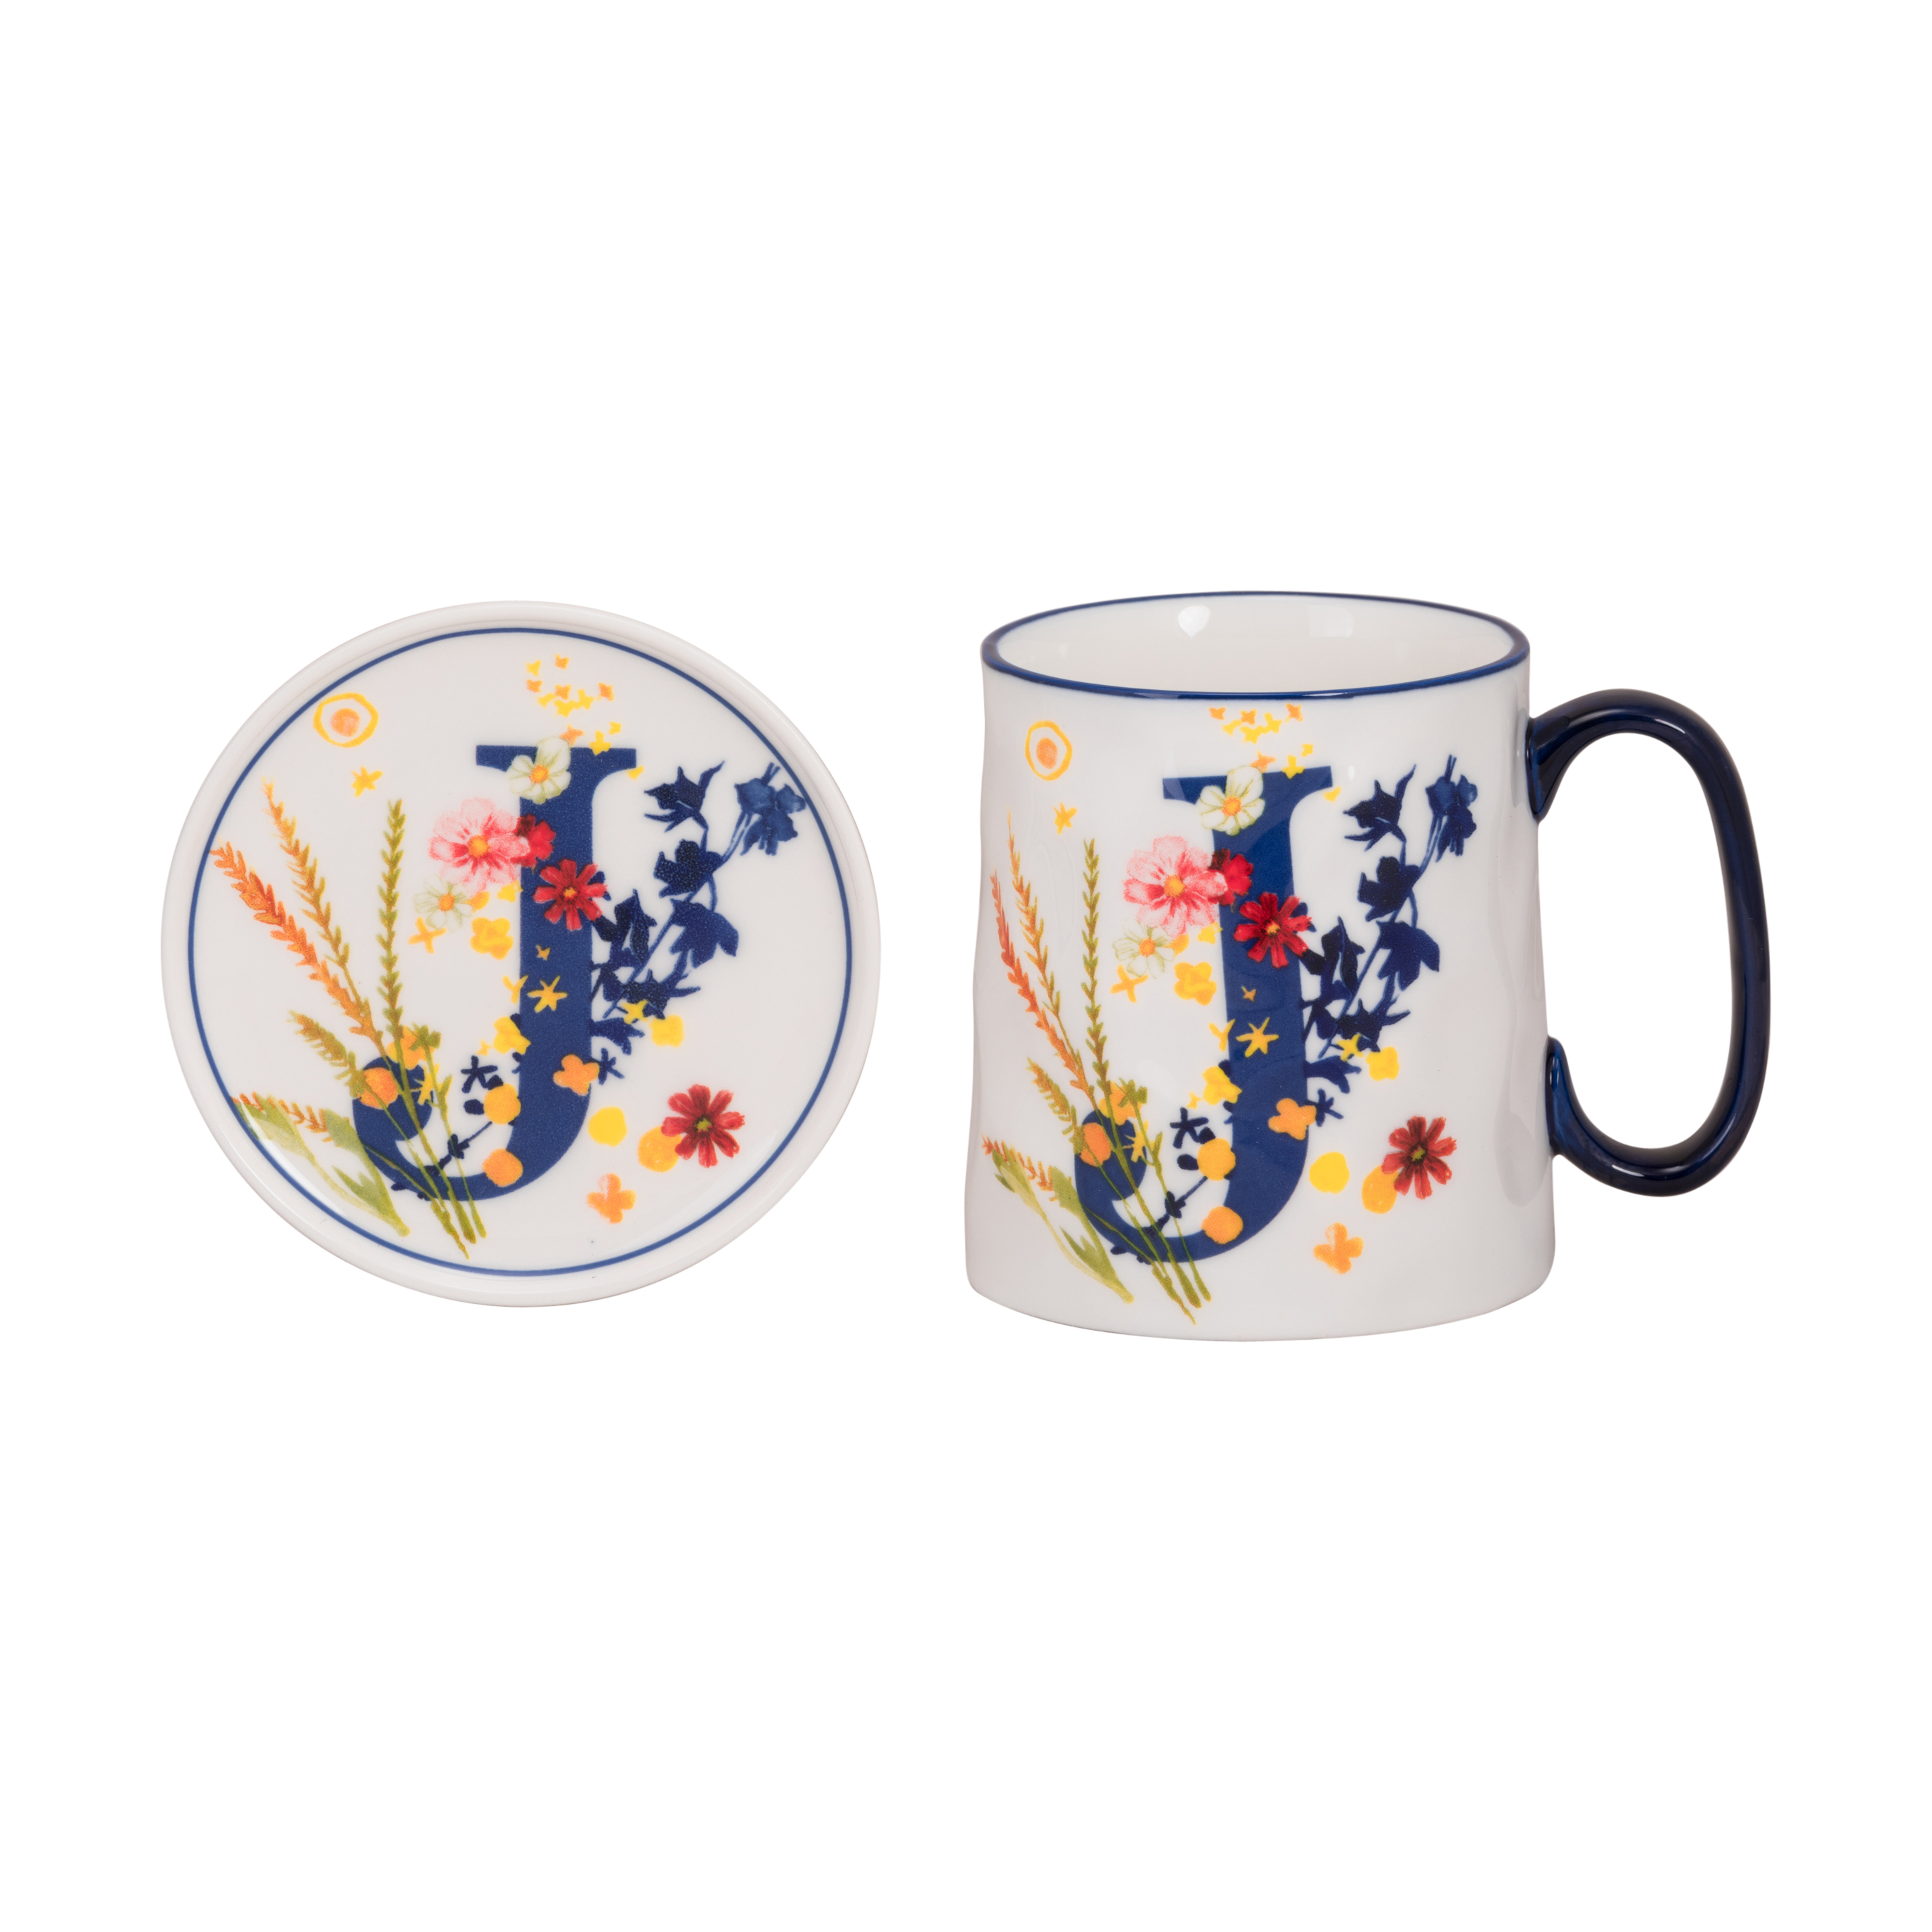 Bella Initial Mug & Coaster Set